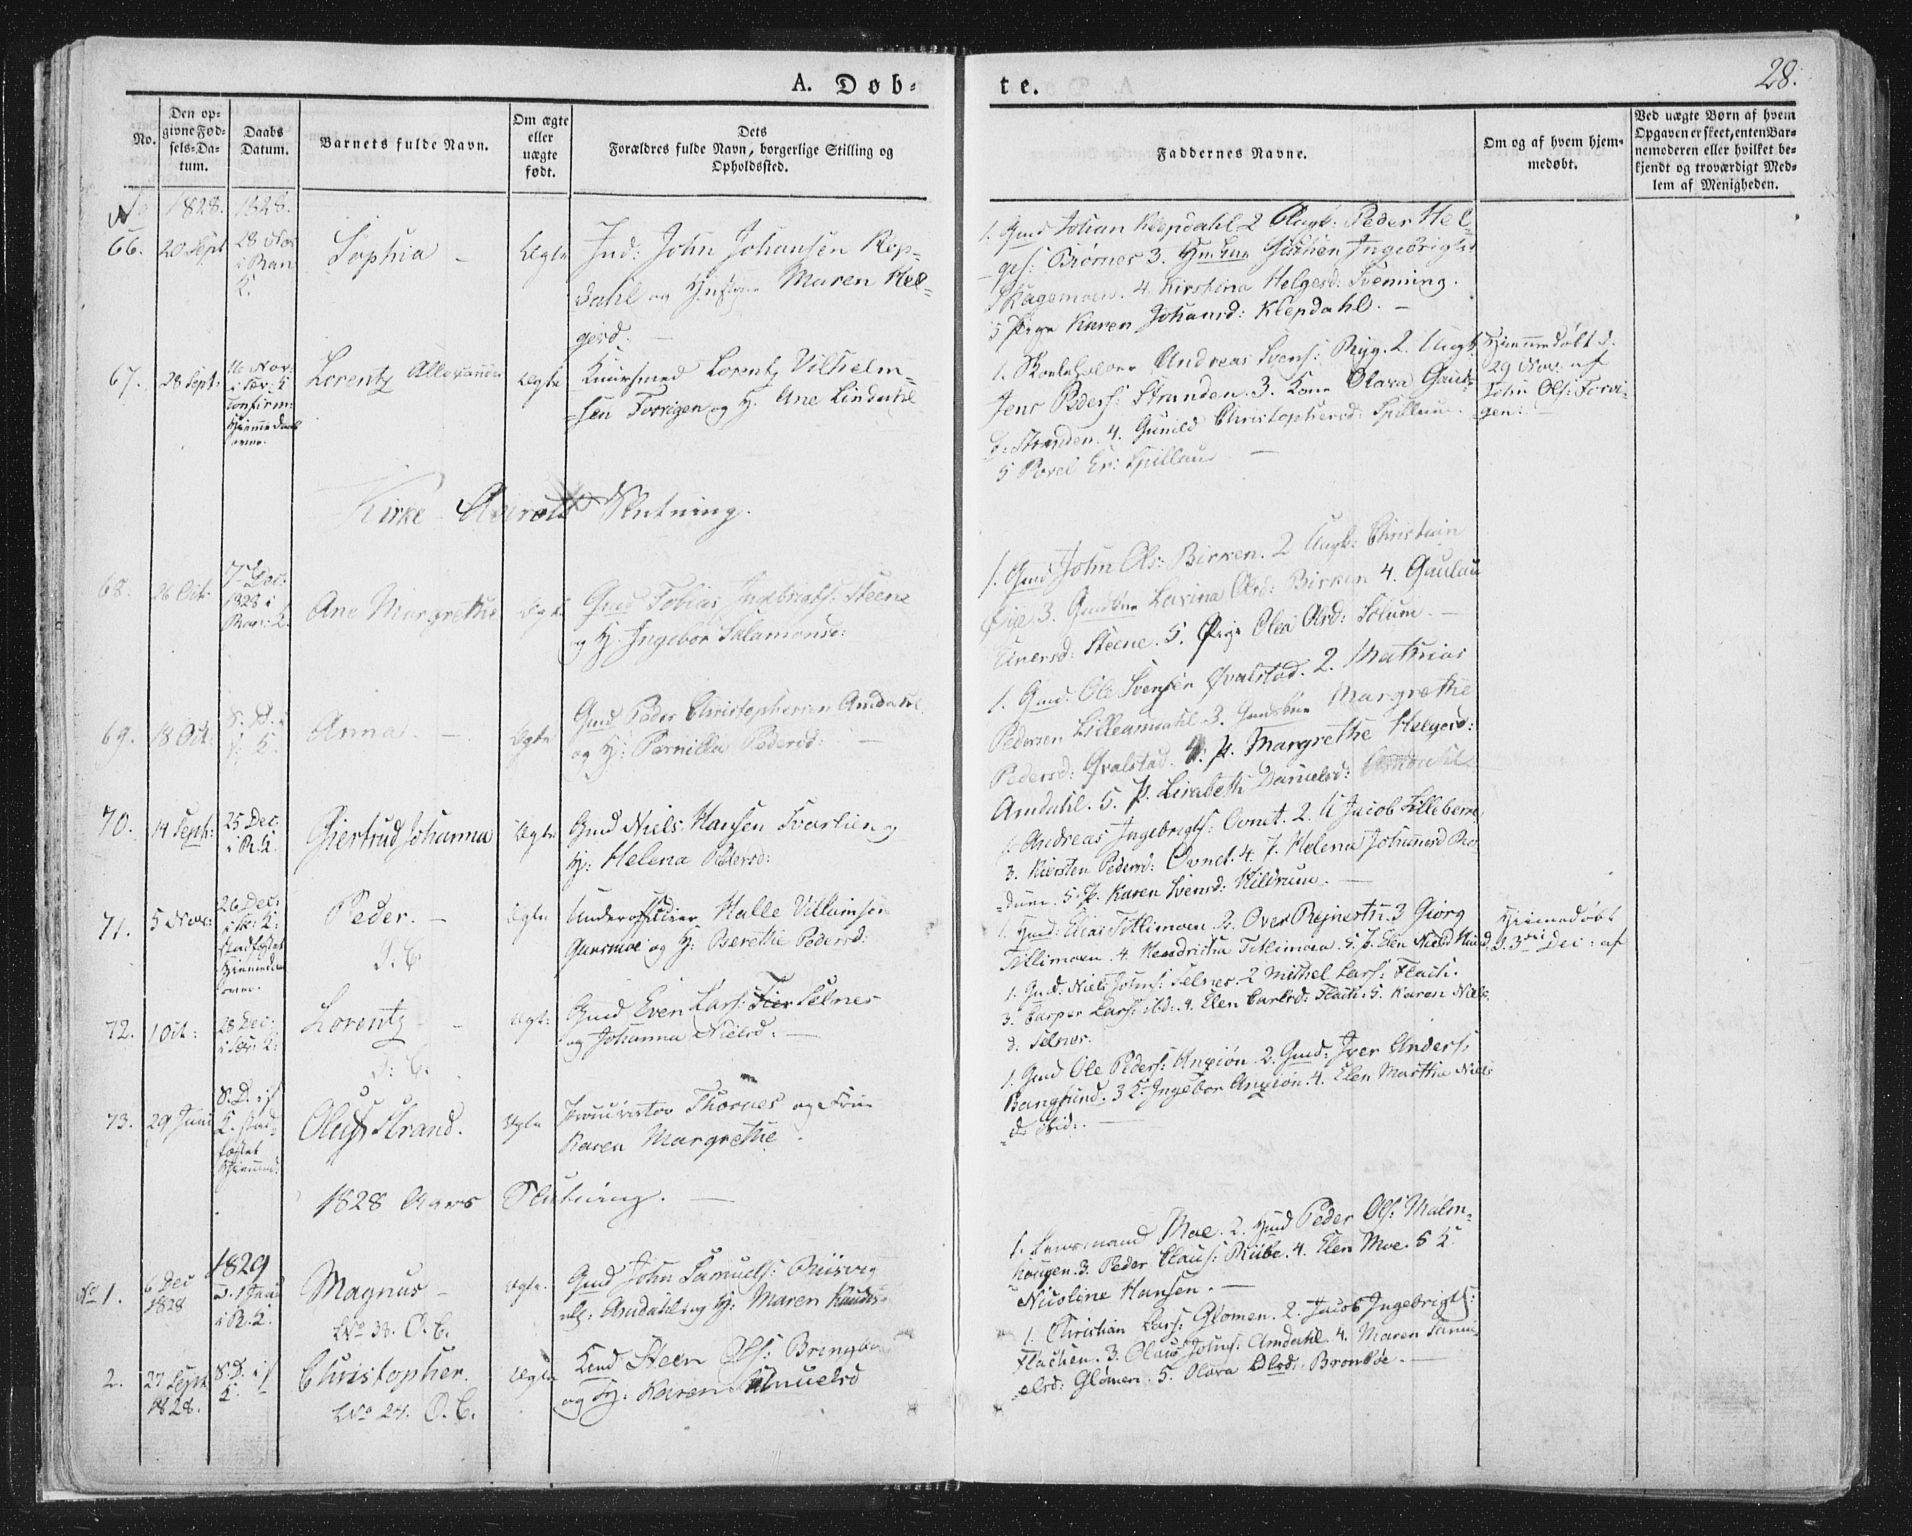 SAT, Ministerialprotokoller, klokkerbøker og fødselsregistre - Nord-Trøndelag, 764/L0551: Ministerialbok nr. 764A07a, 1824-1864, s. 28